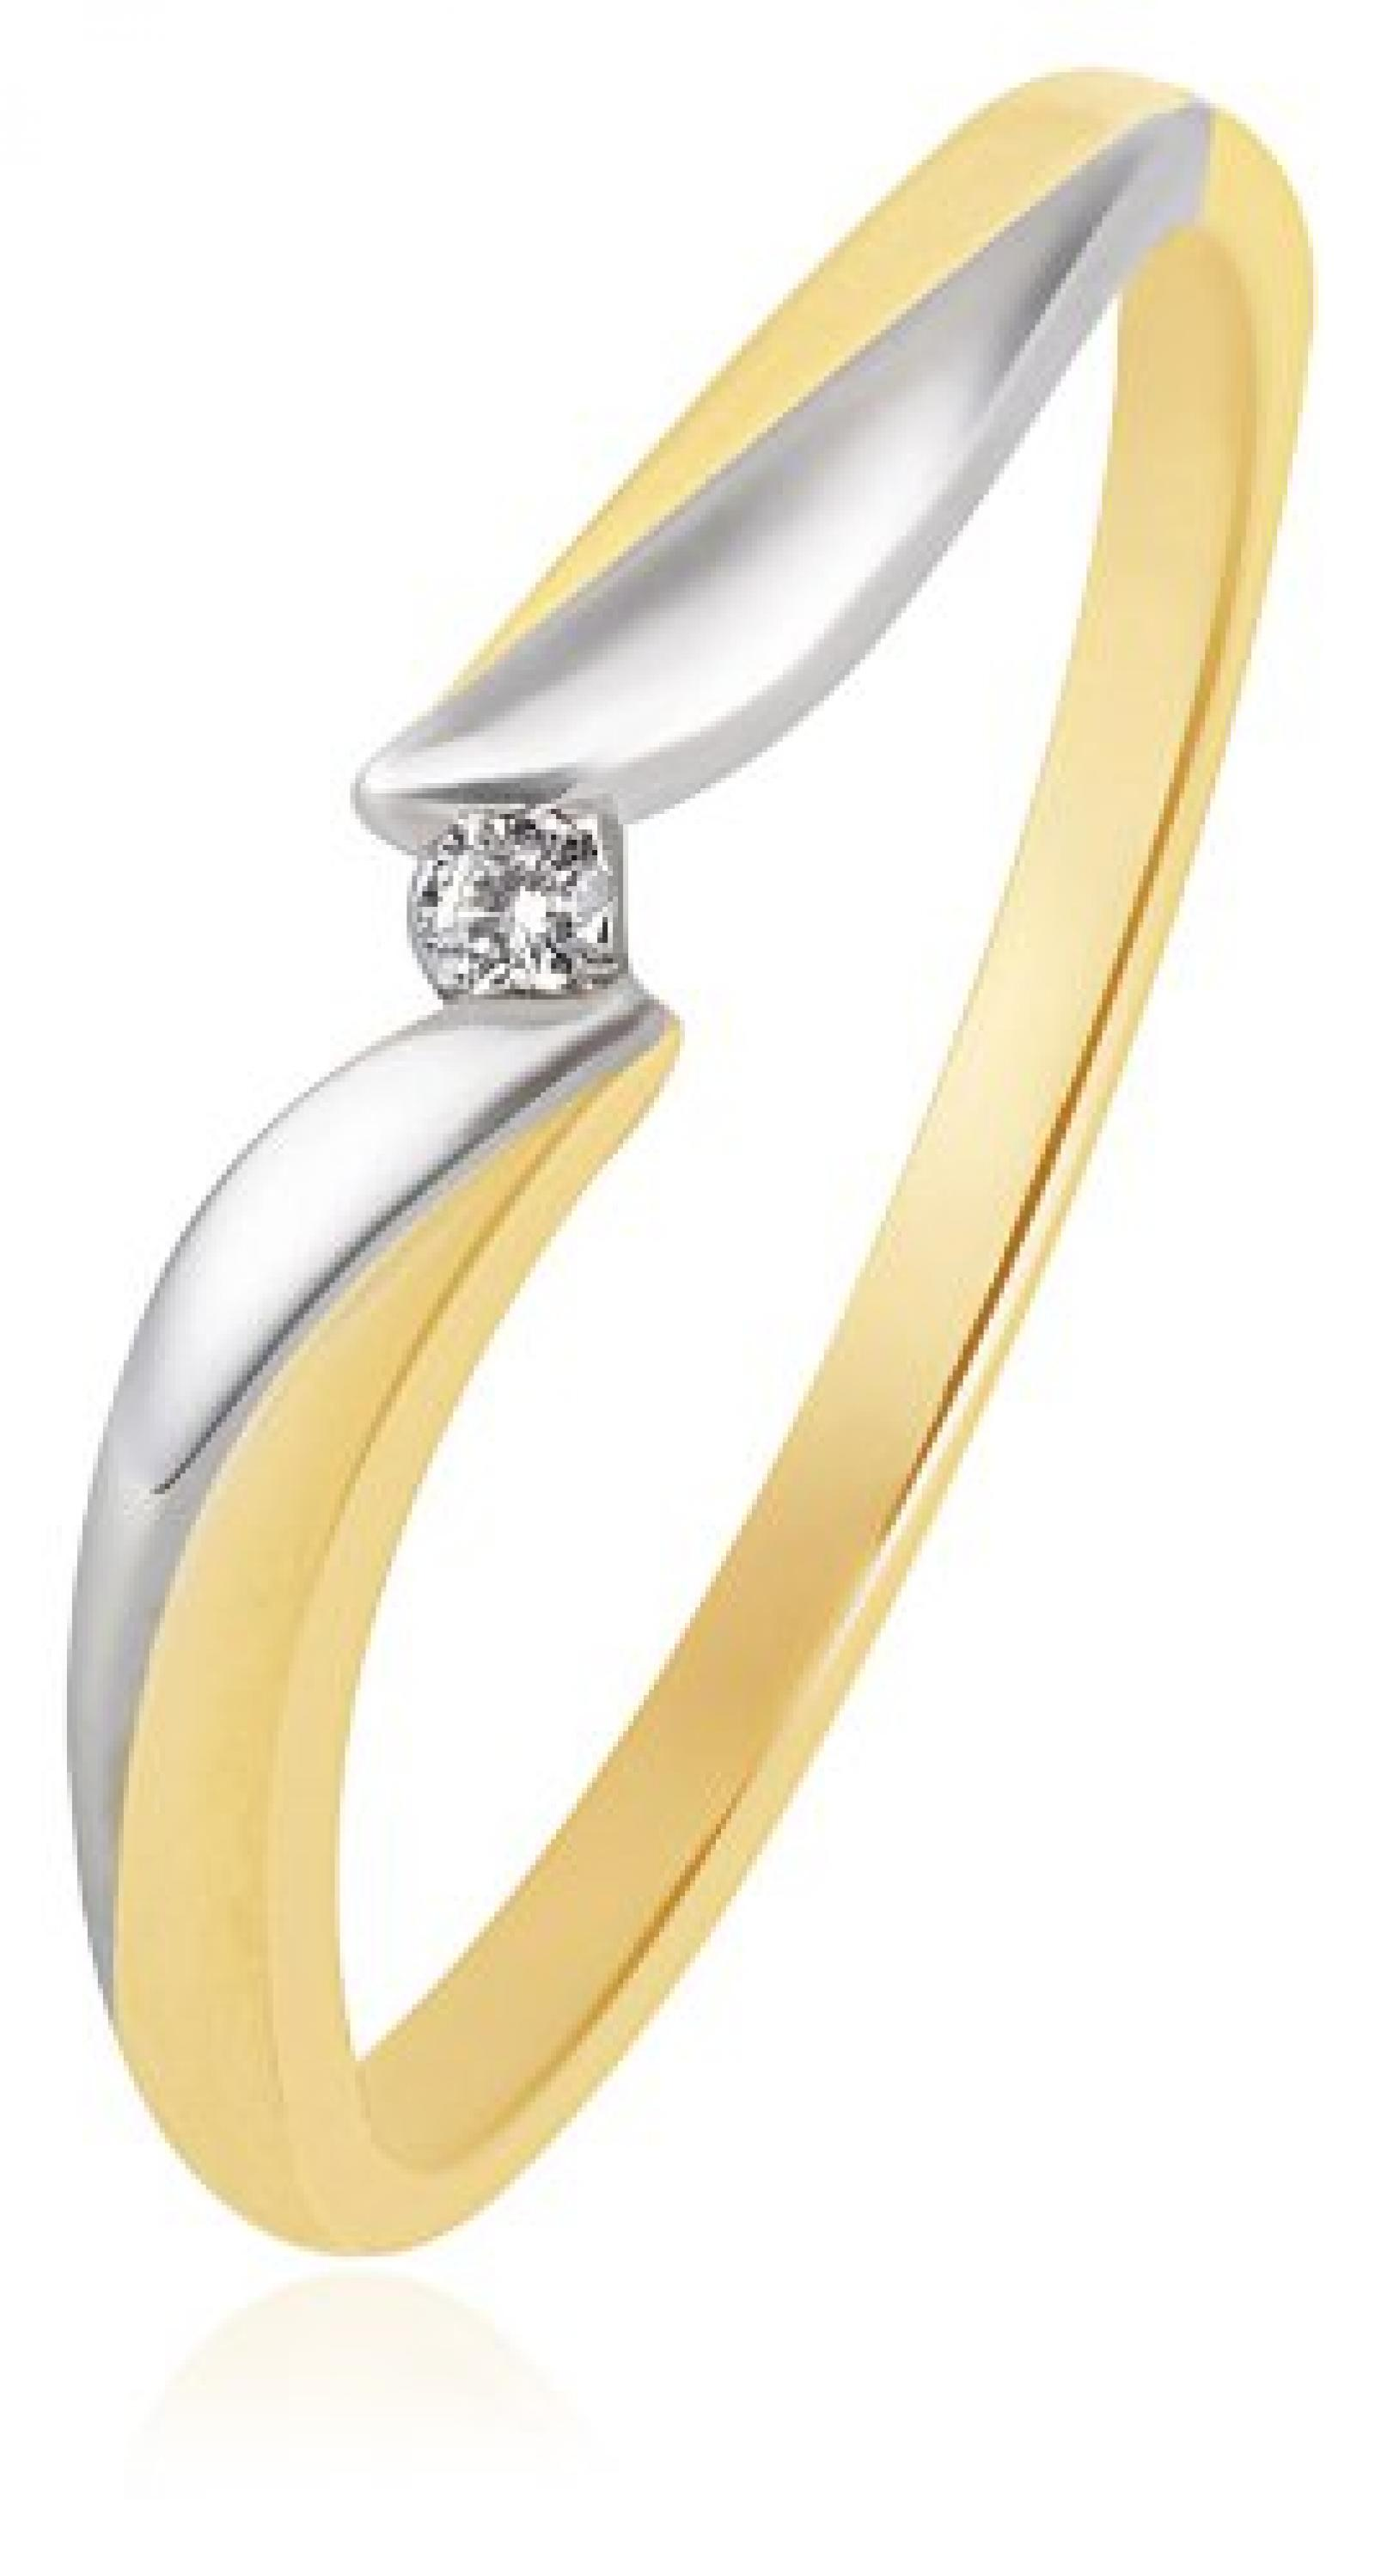 Goldmaid Damen-Ring Bicolor 585 Gold 1 Brillant 0,02 ct. So R3244BI